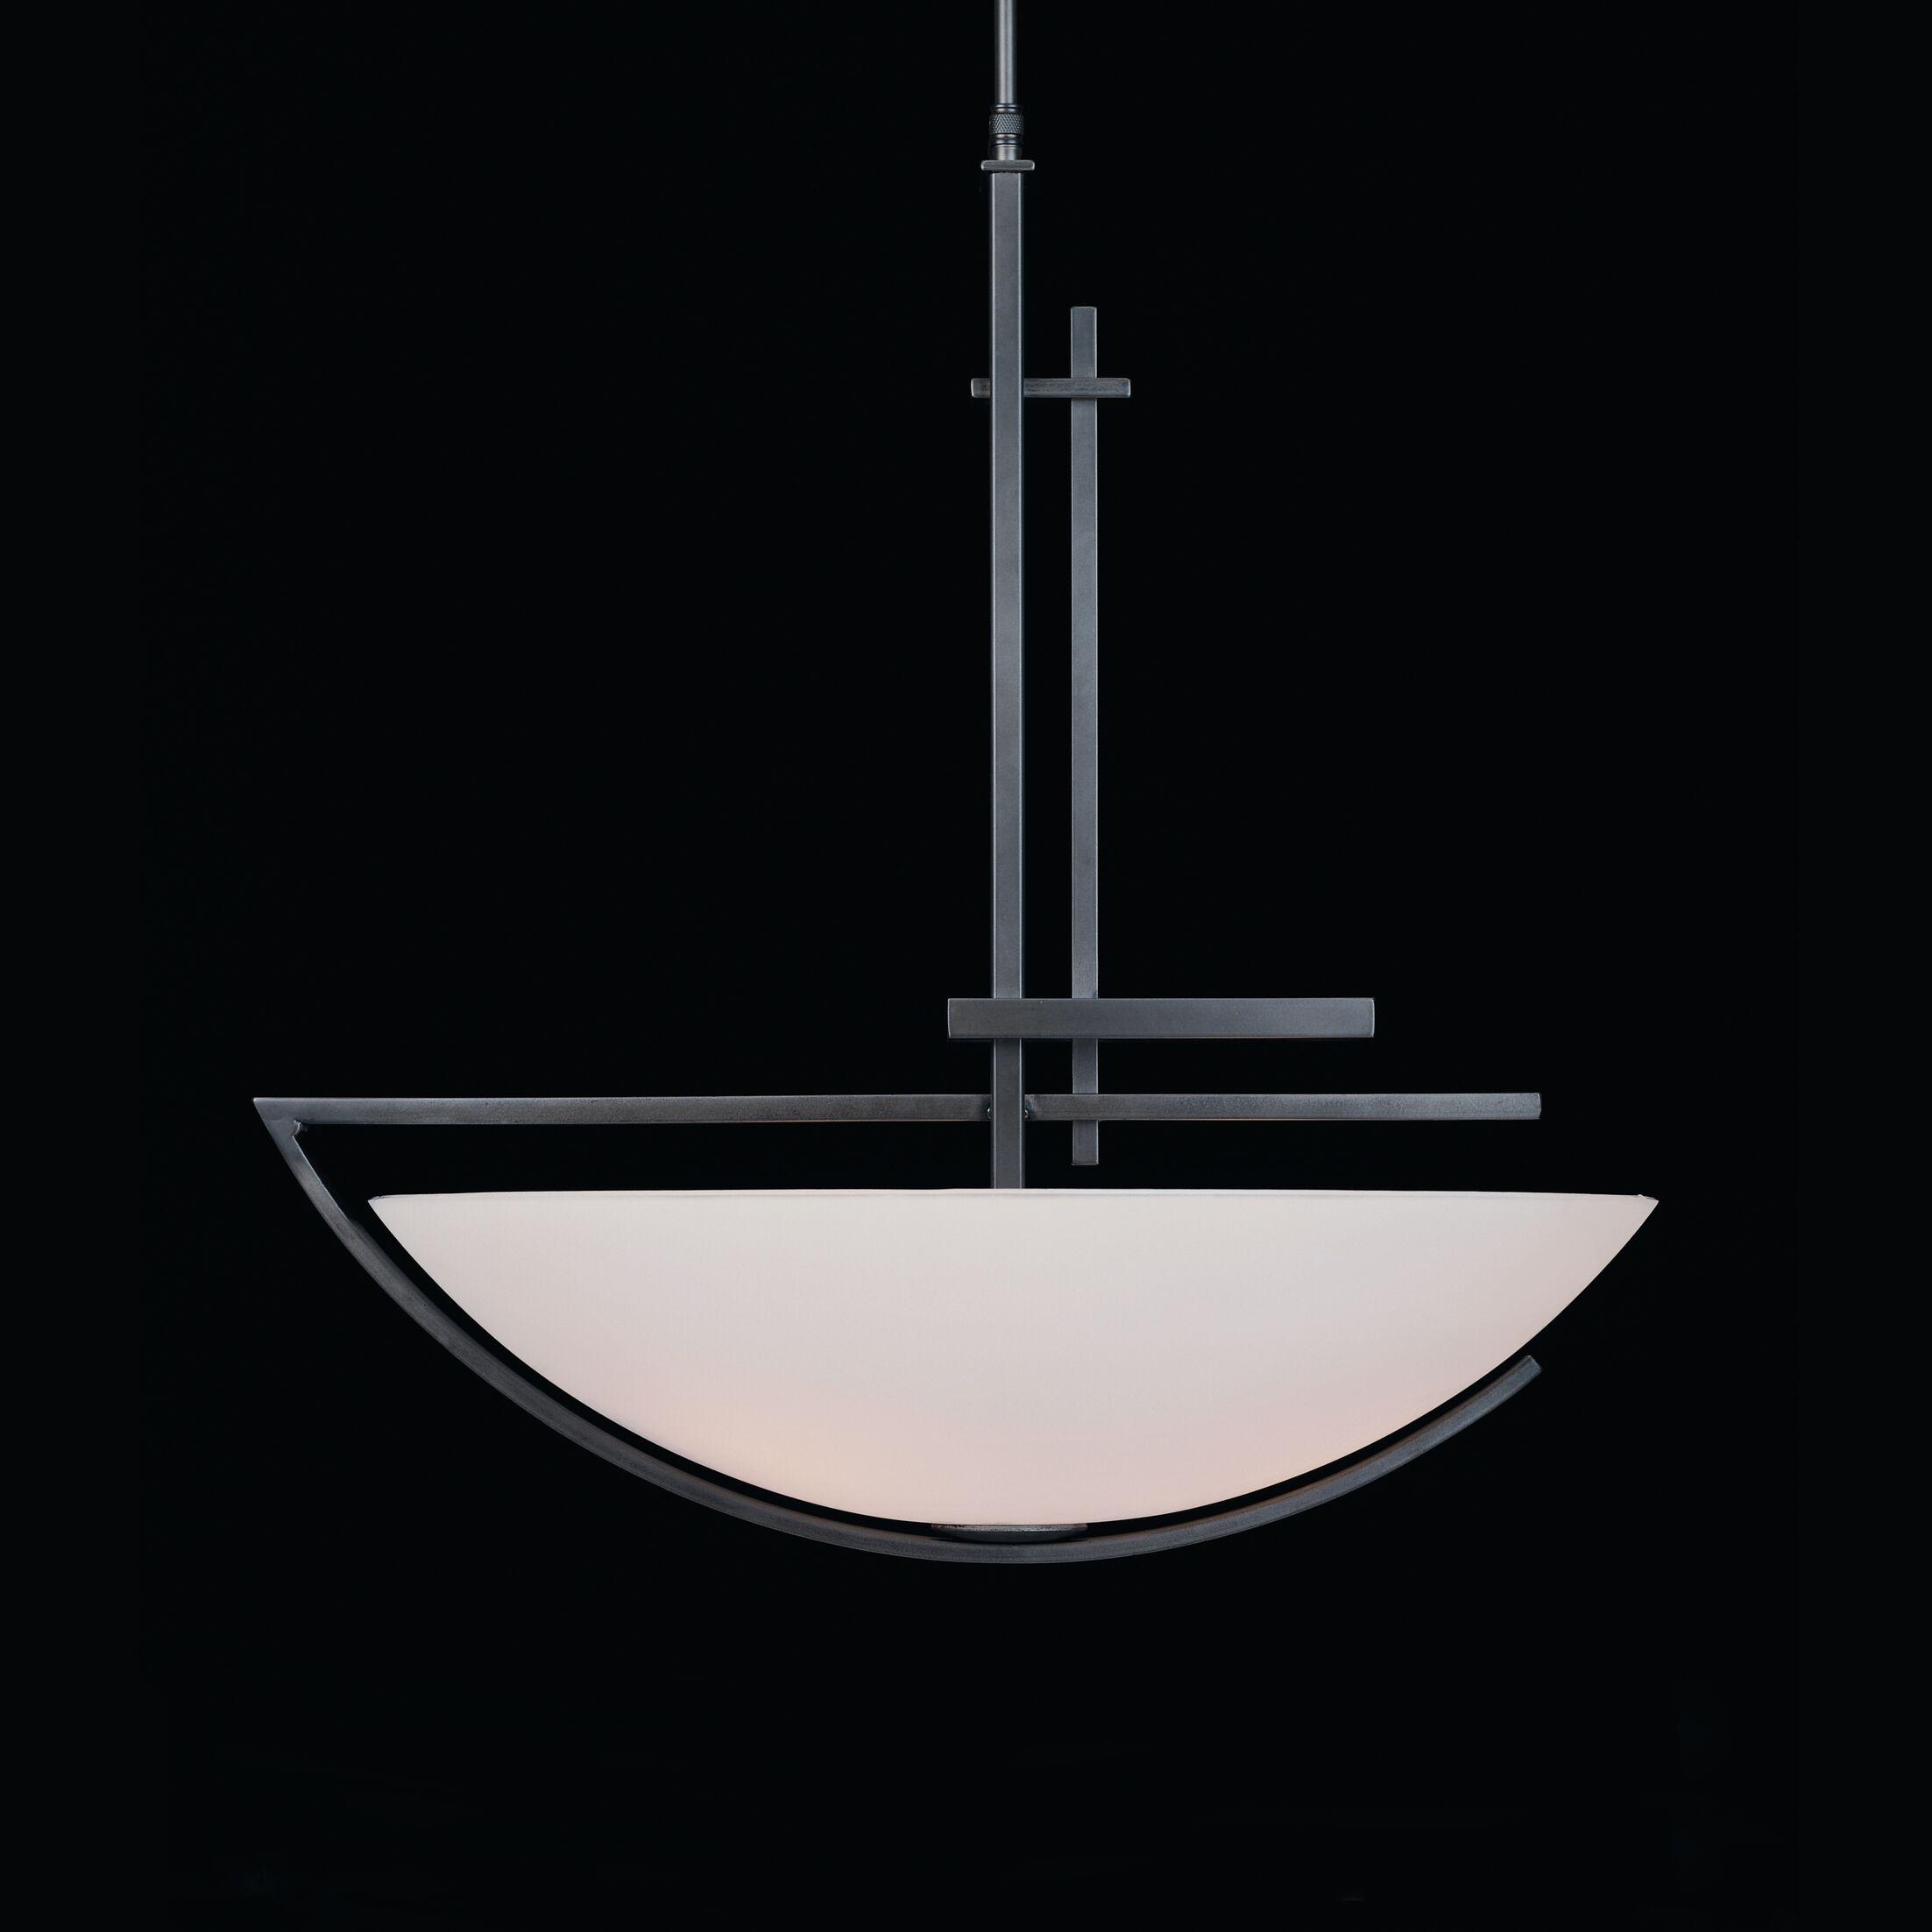 Ondrian 3-Light Bowl Pendant Finish: Mahogany, Shade Color: Opal, Stem Length: 30